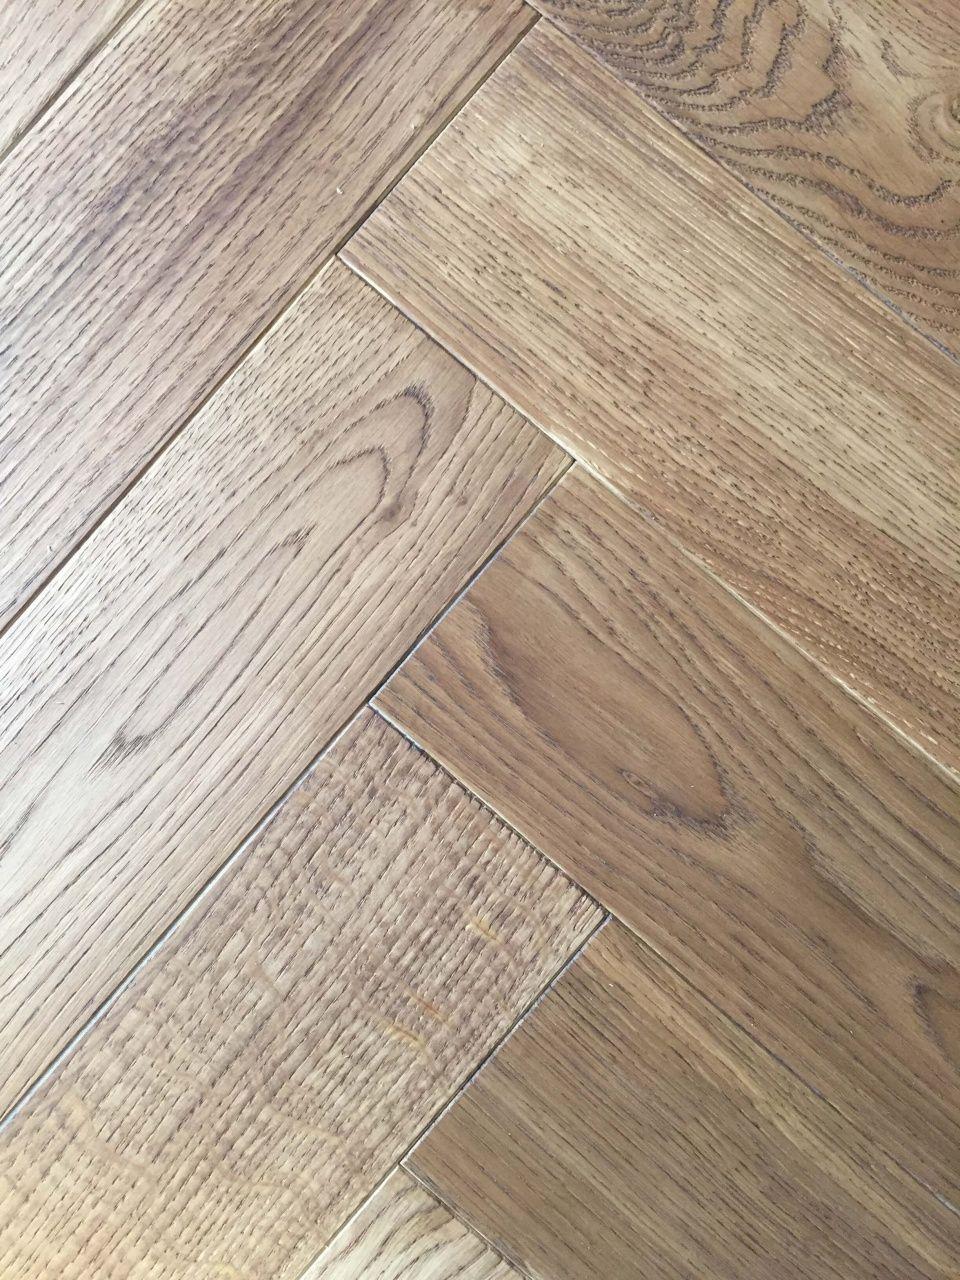 Difference Between Laminate And Vinyl Flooring In 2020 Engineered Wood Floors Wood Laminate Flooring Engineered Hardwood Flooring